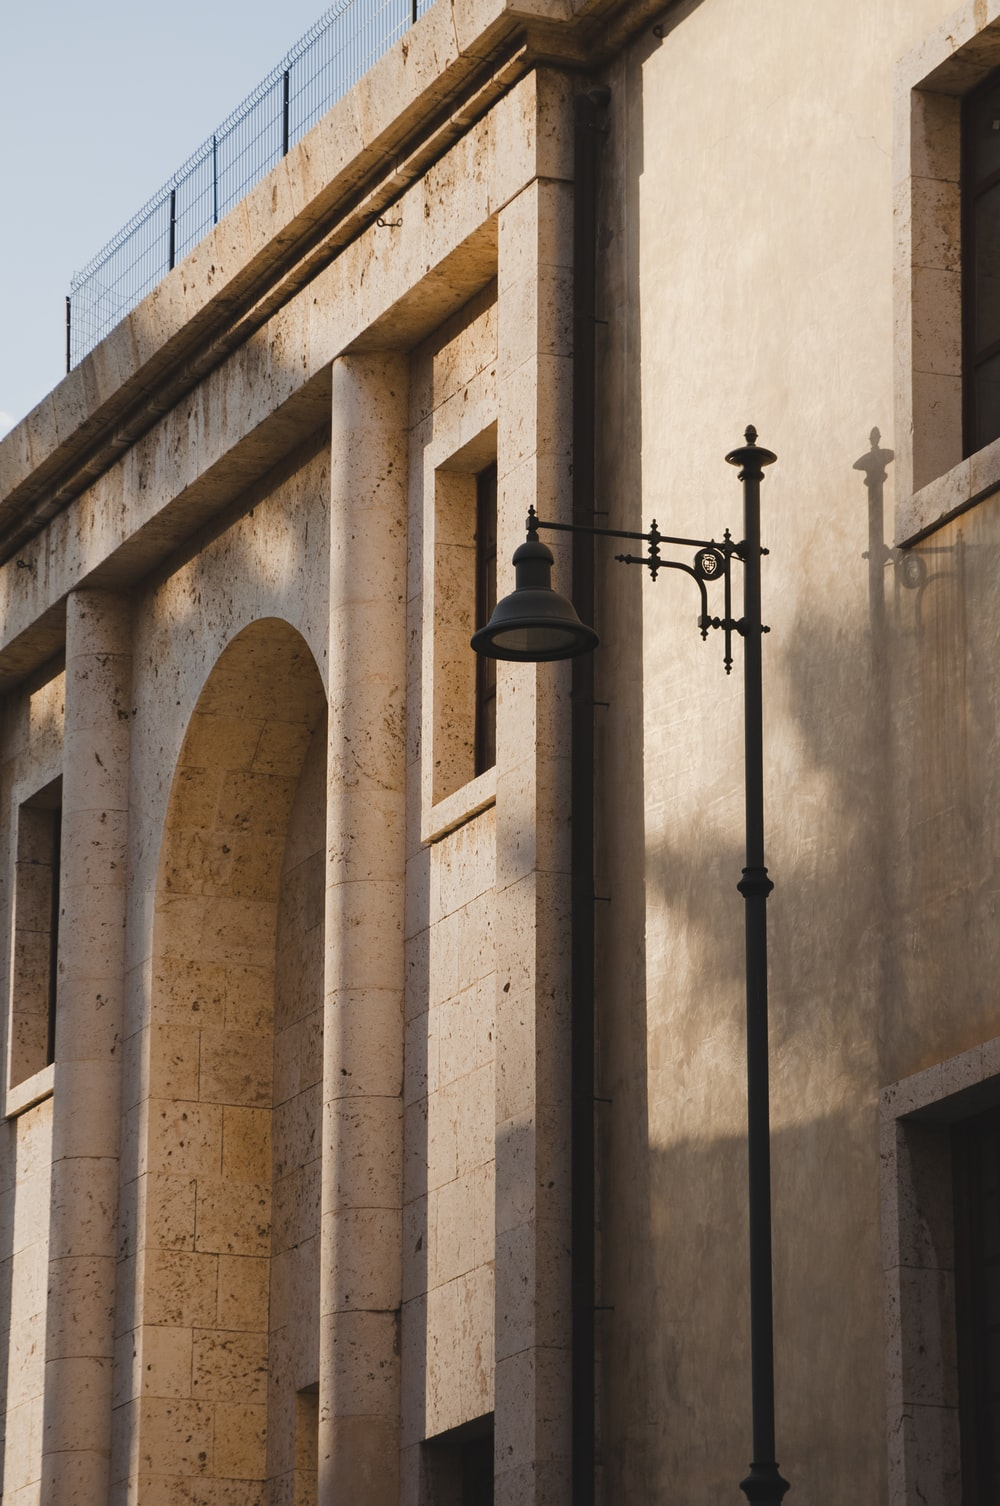 black sconce lamp on brown concrete building